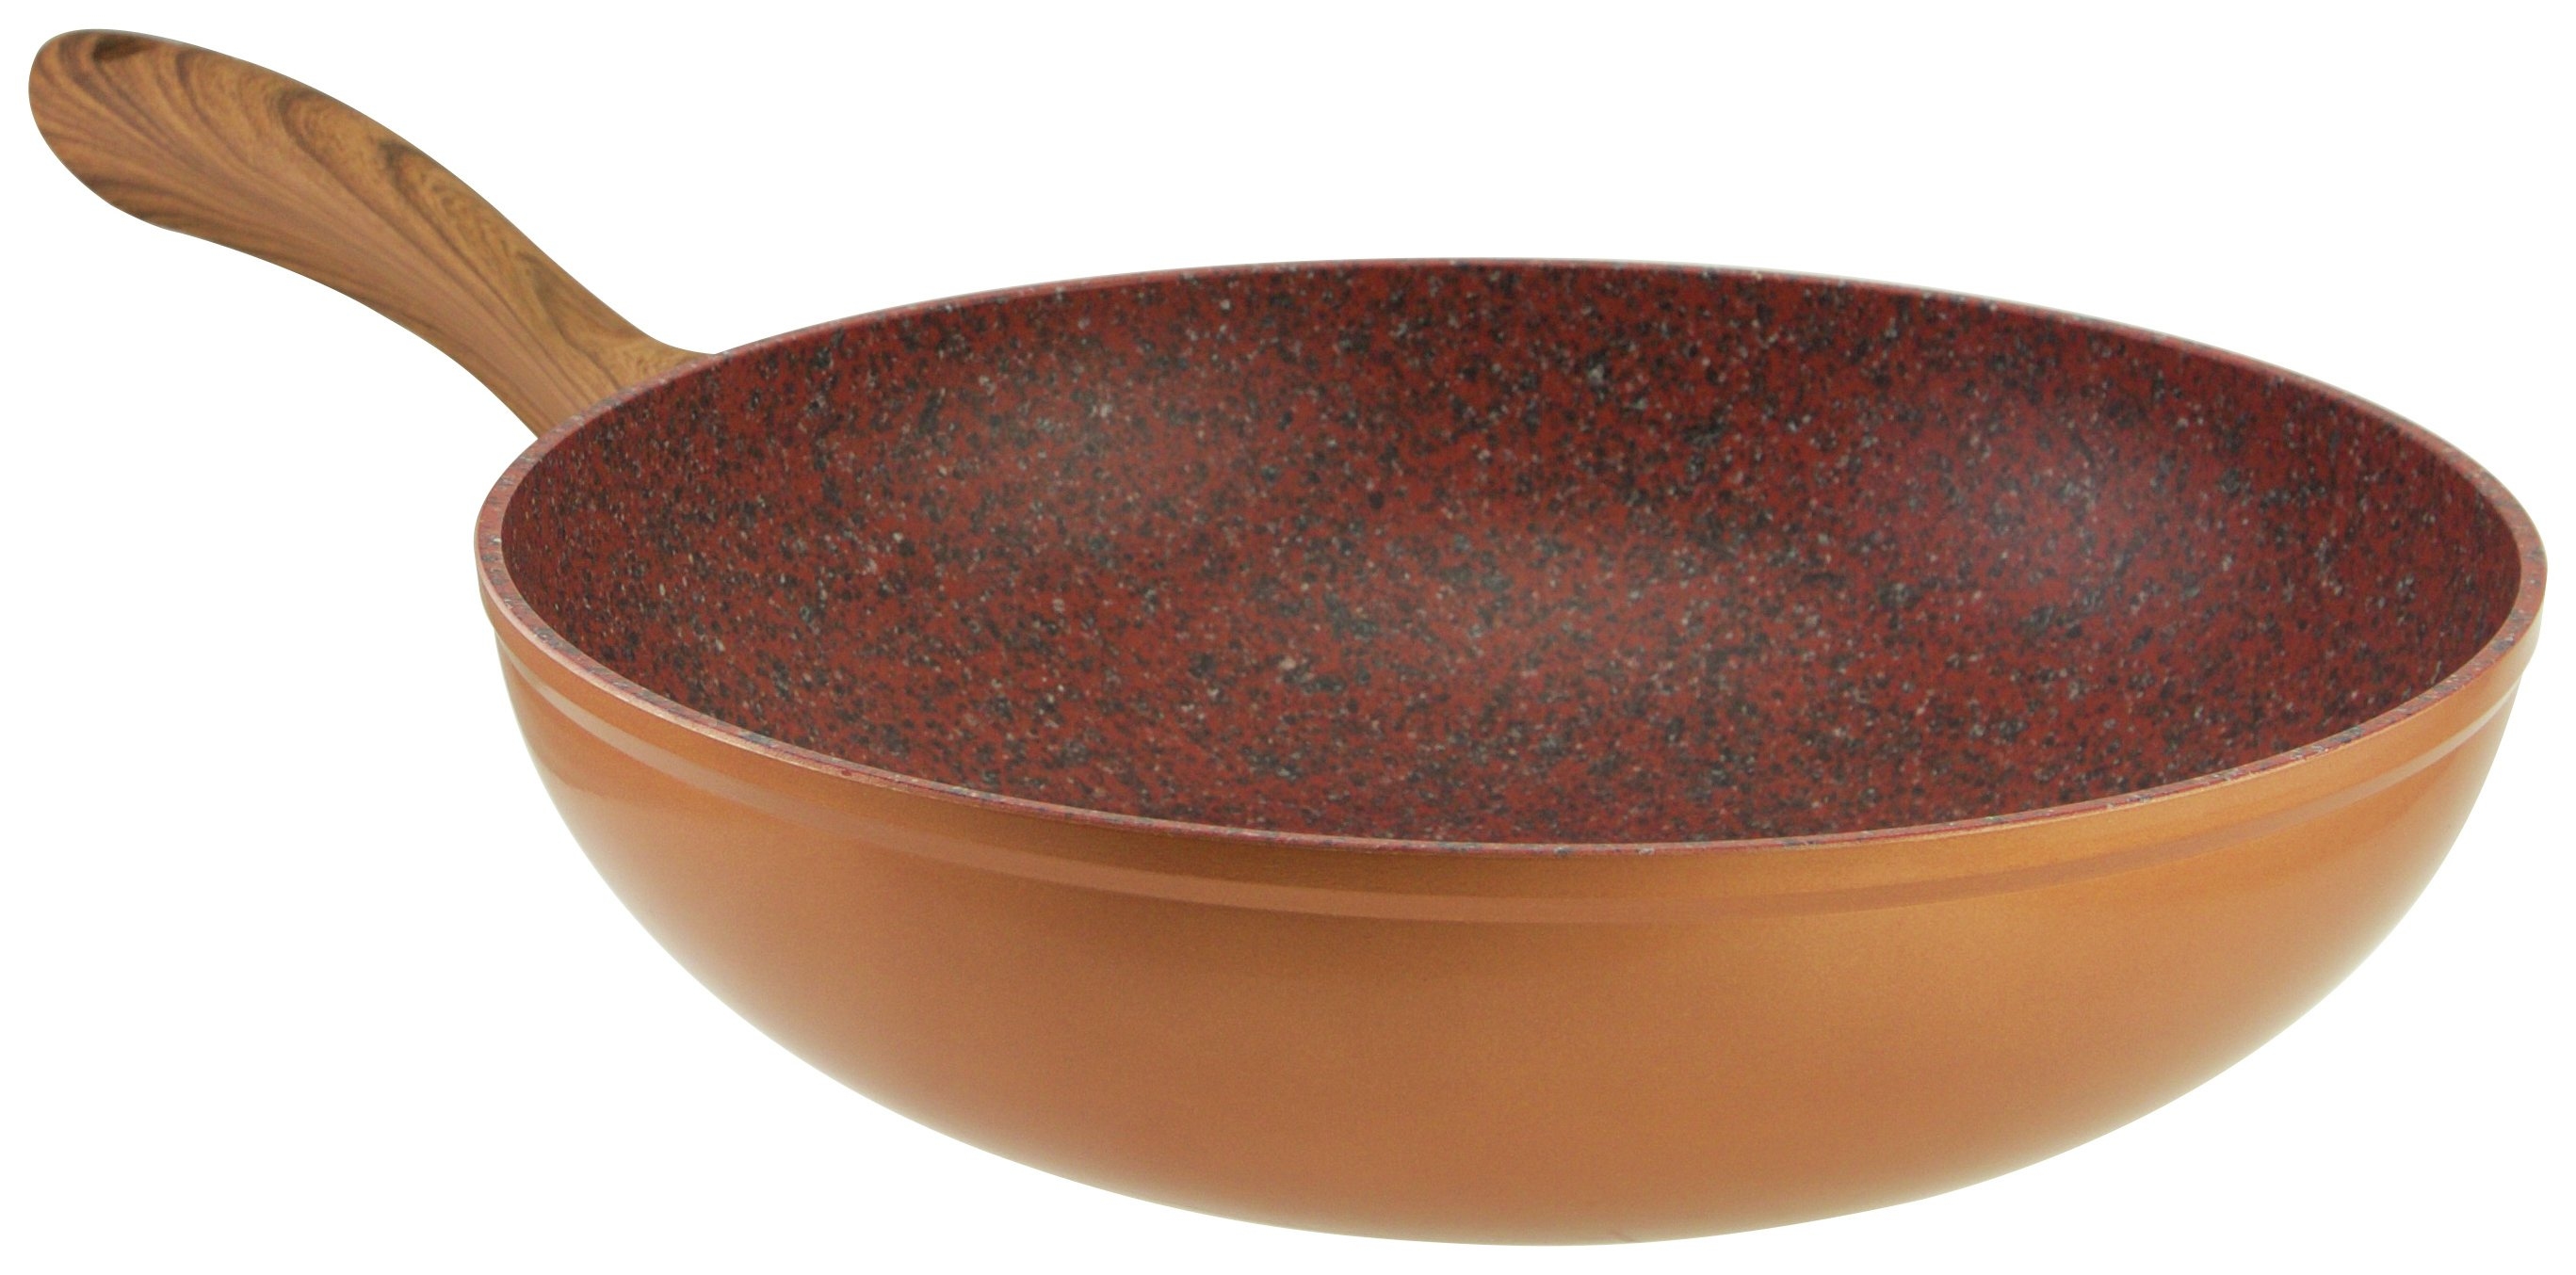 jml regis copper stone pan 28cm. Black Bedroom Furniture Sets. Home Design Ideas